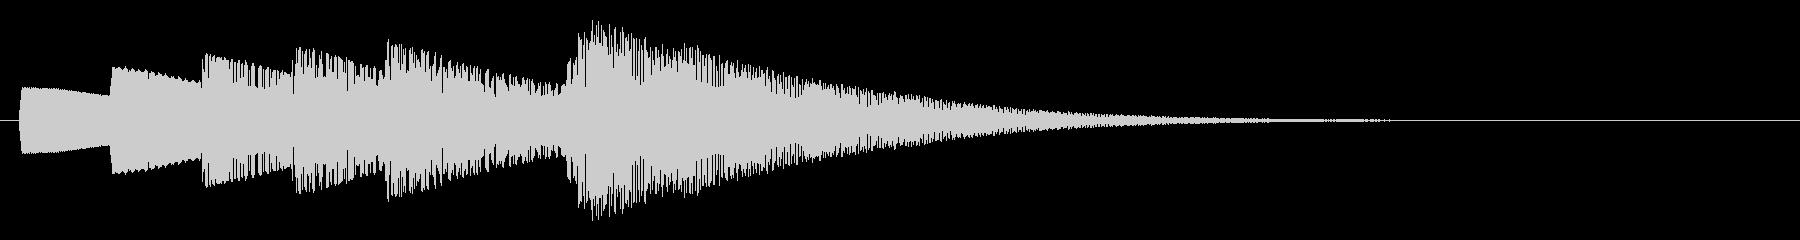 KANT入店音ジングル010144の未再生の波形